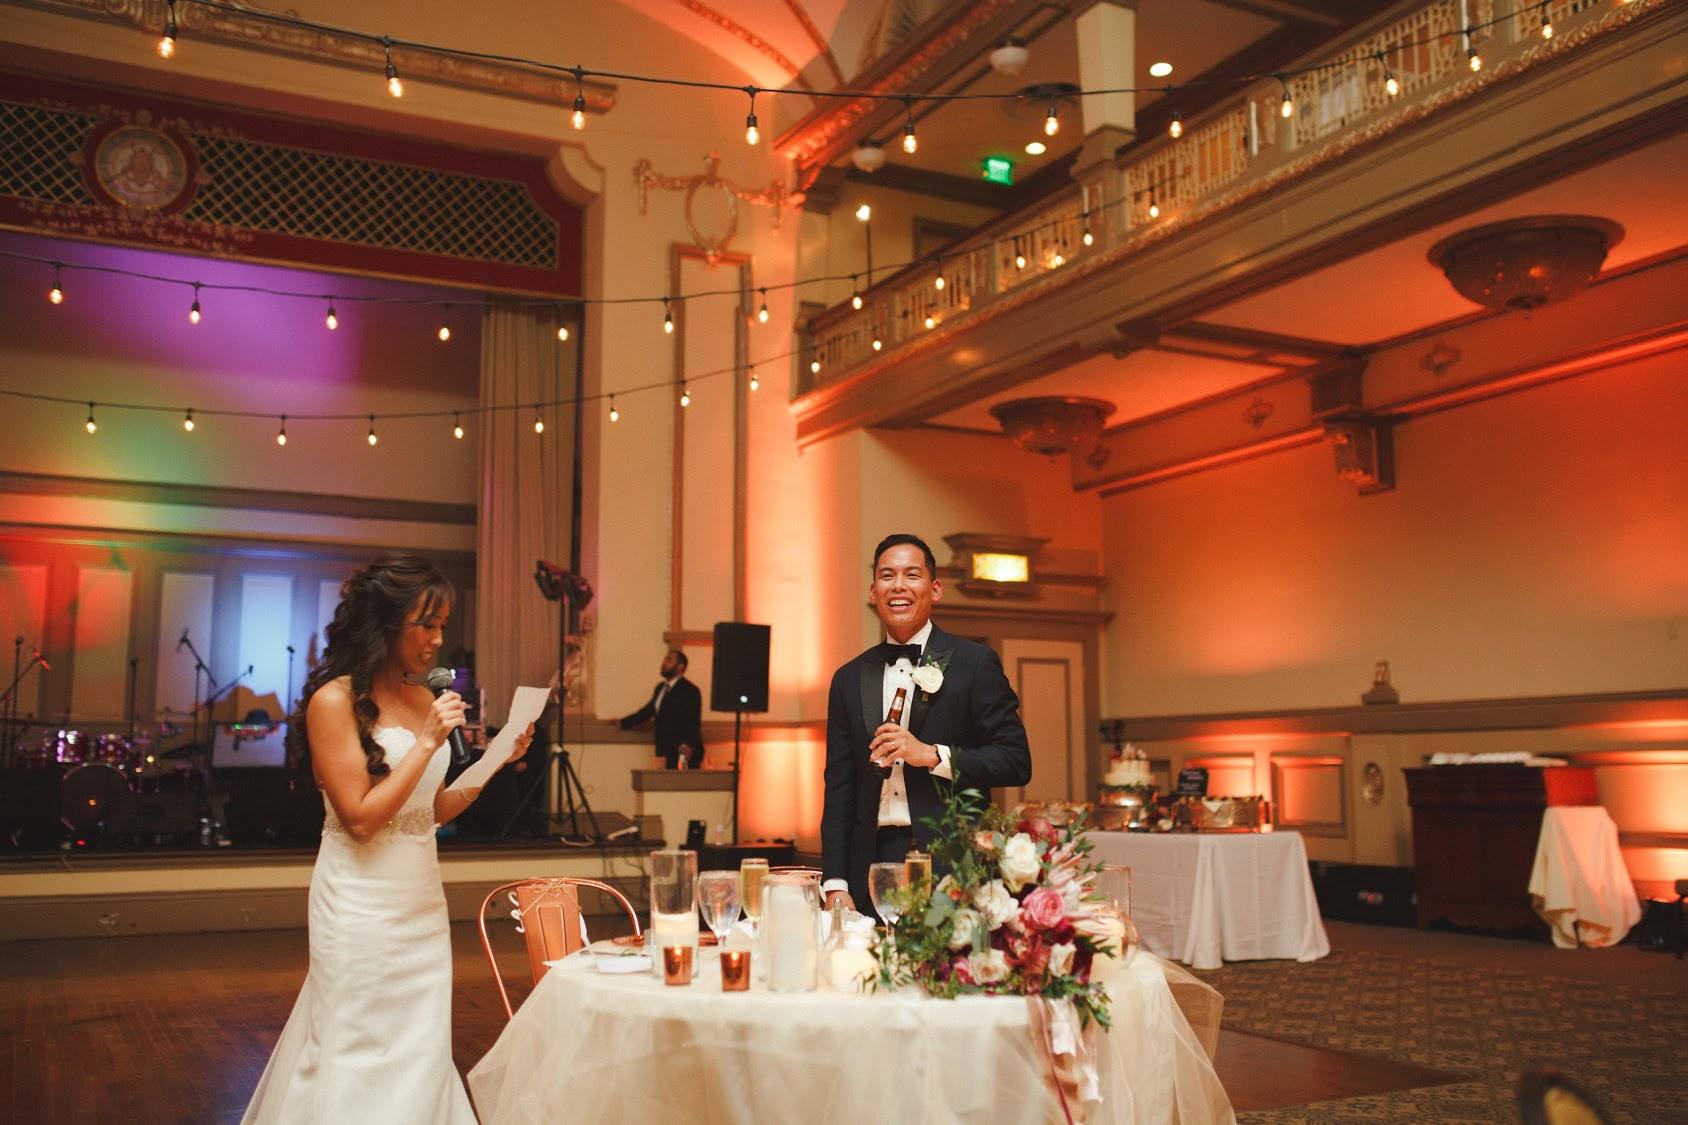 John Marshall Ballrooms Wedding Lighting